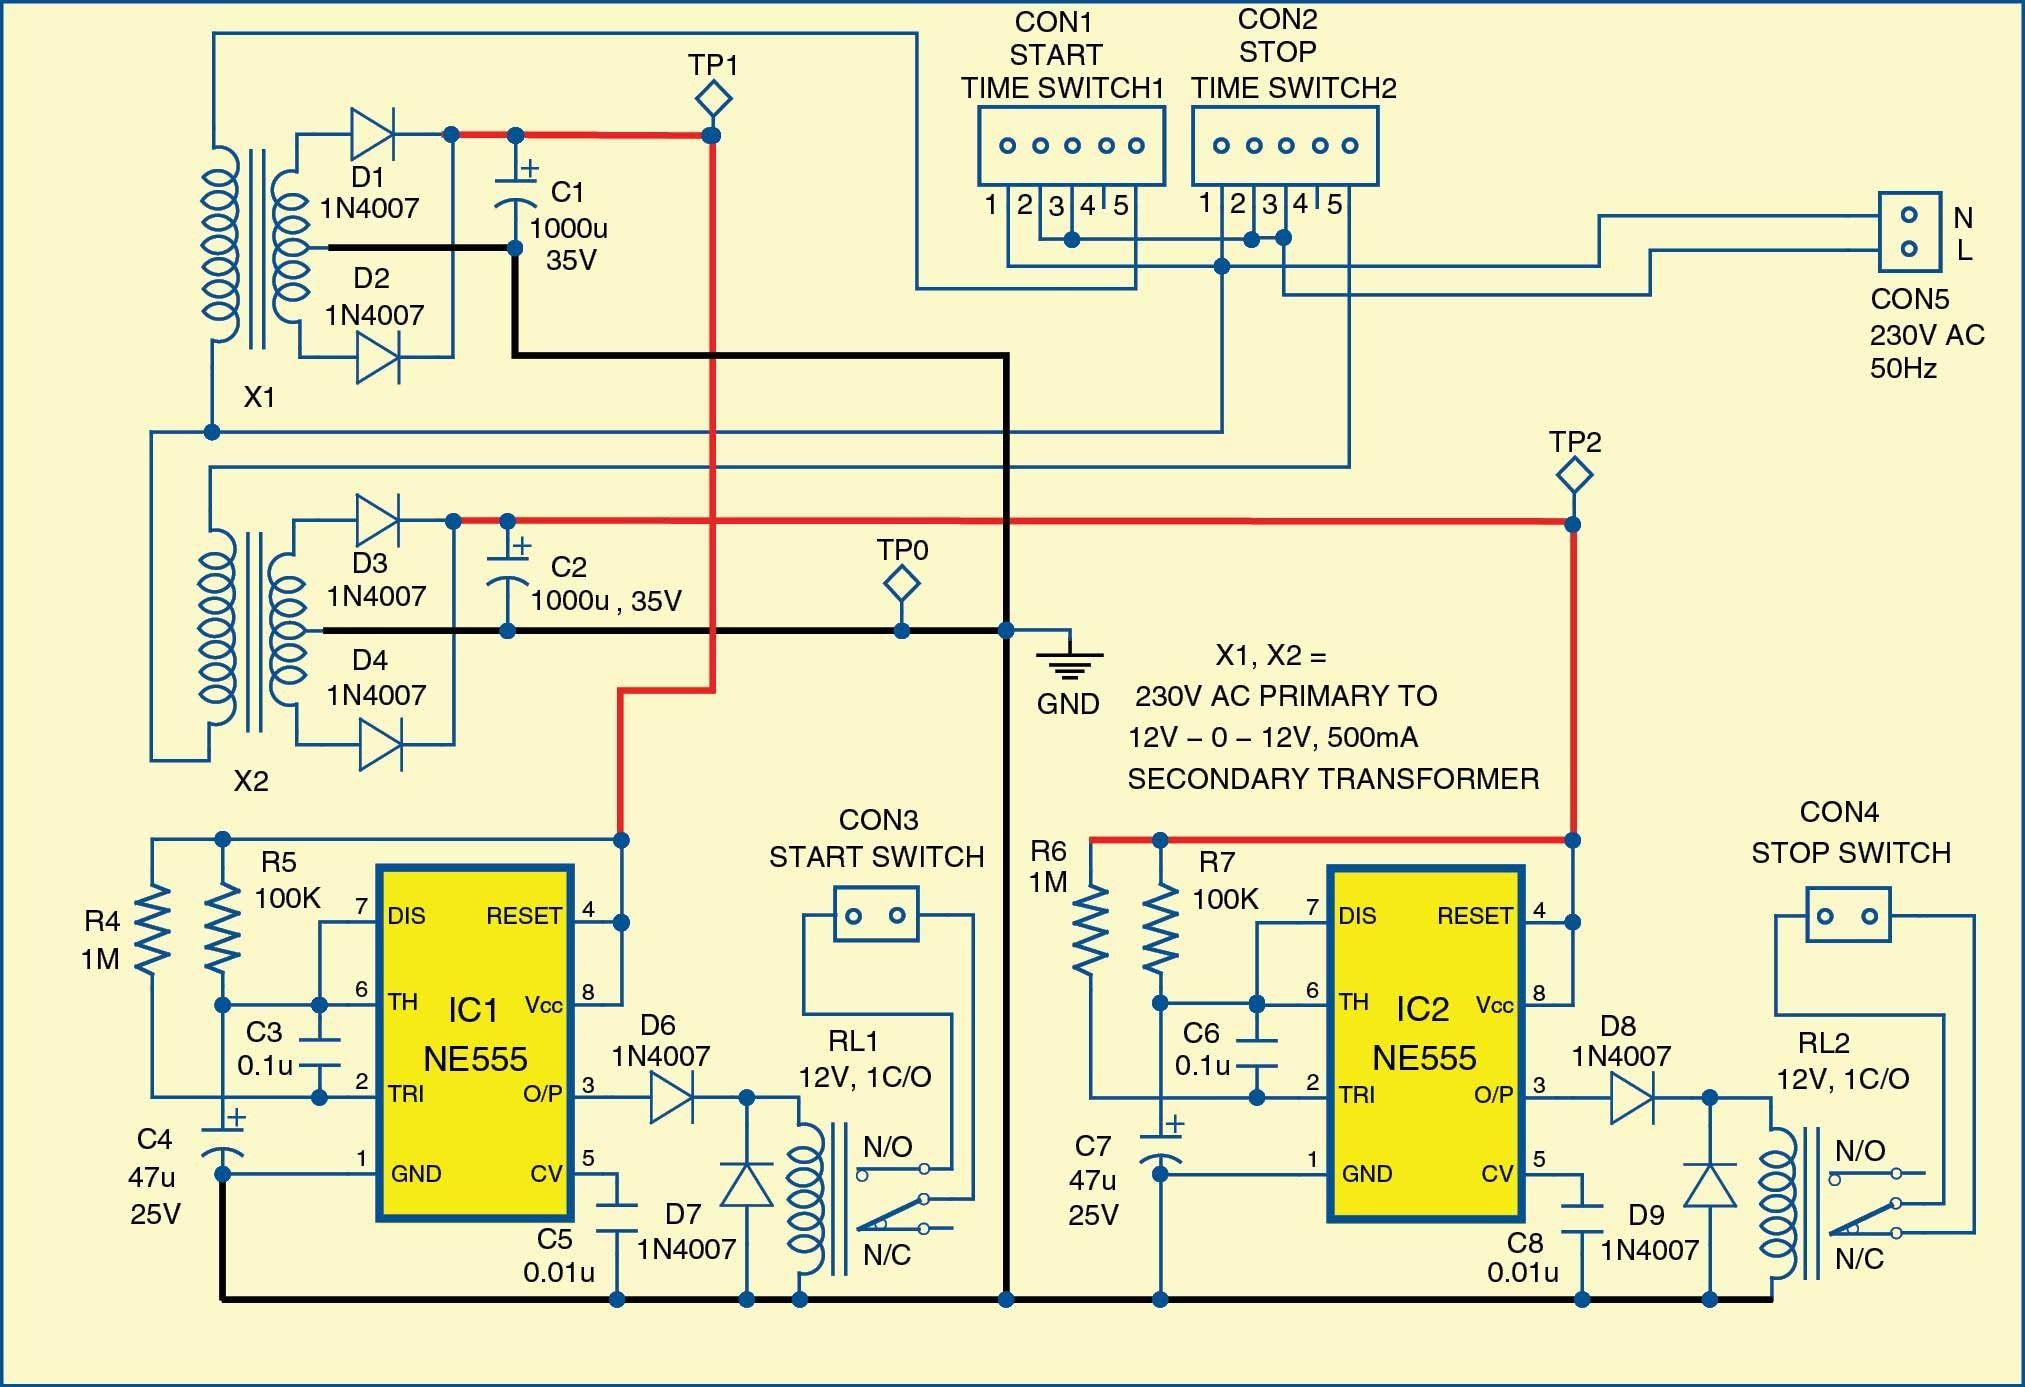 New Wiring Diagram Of Auto Transformer Starter Auto